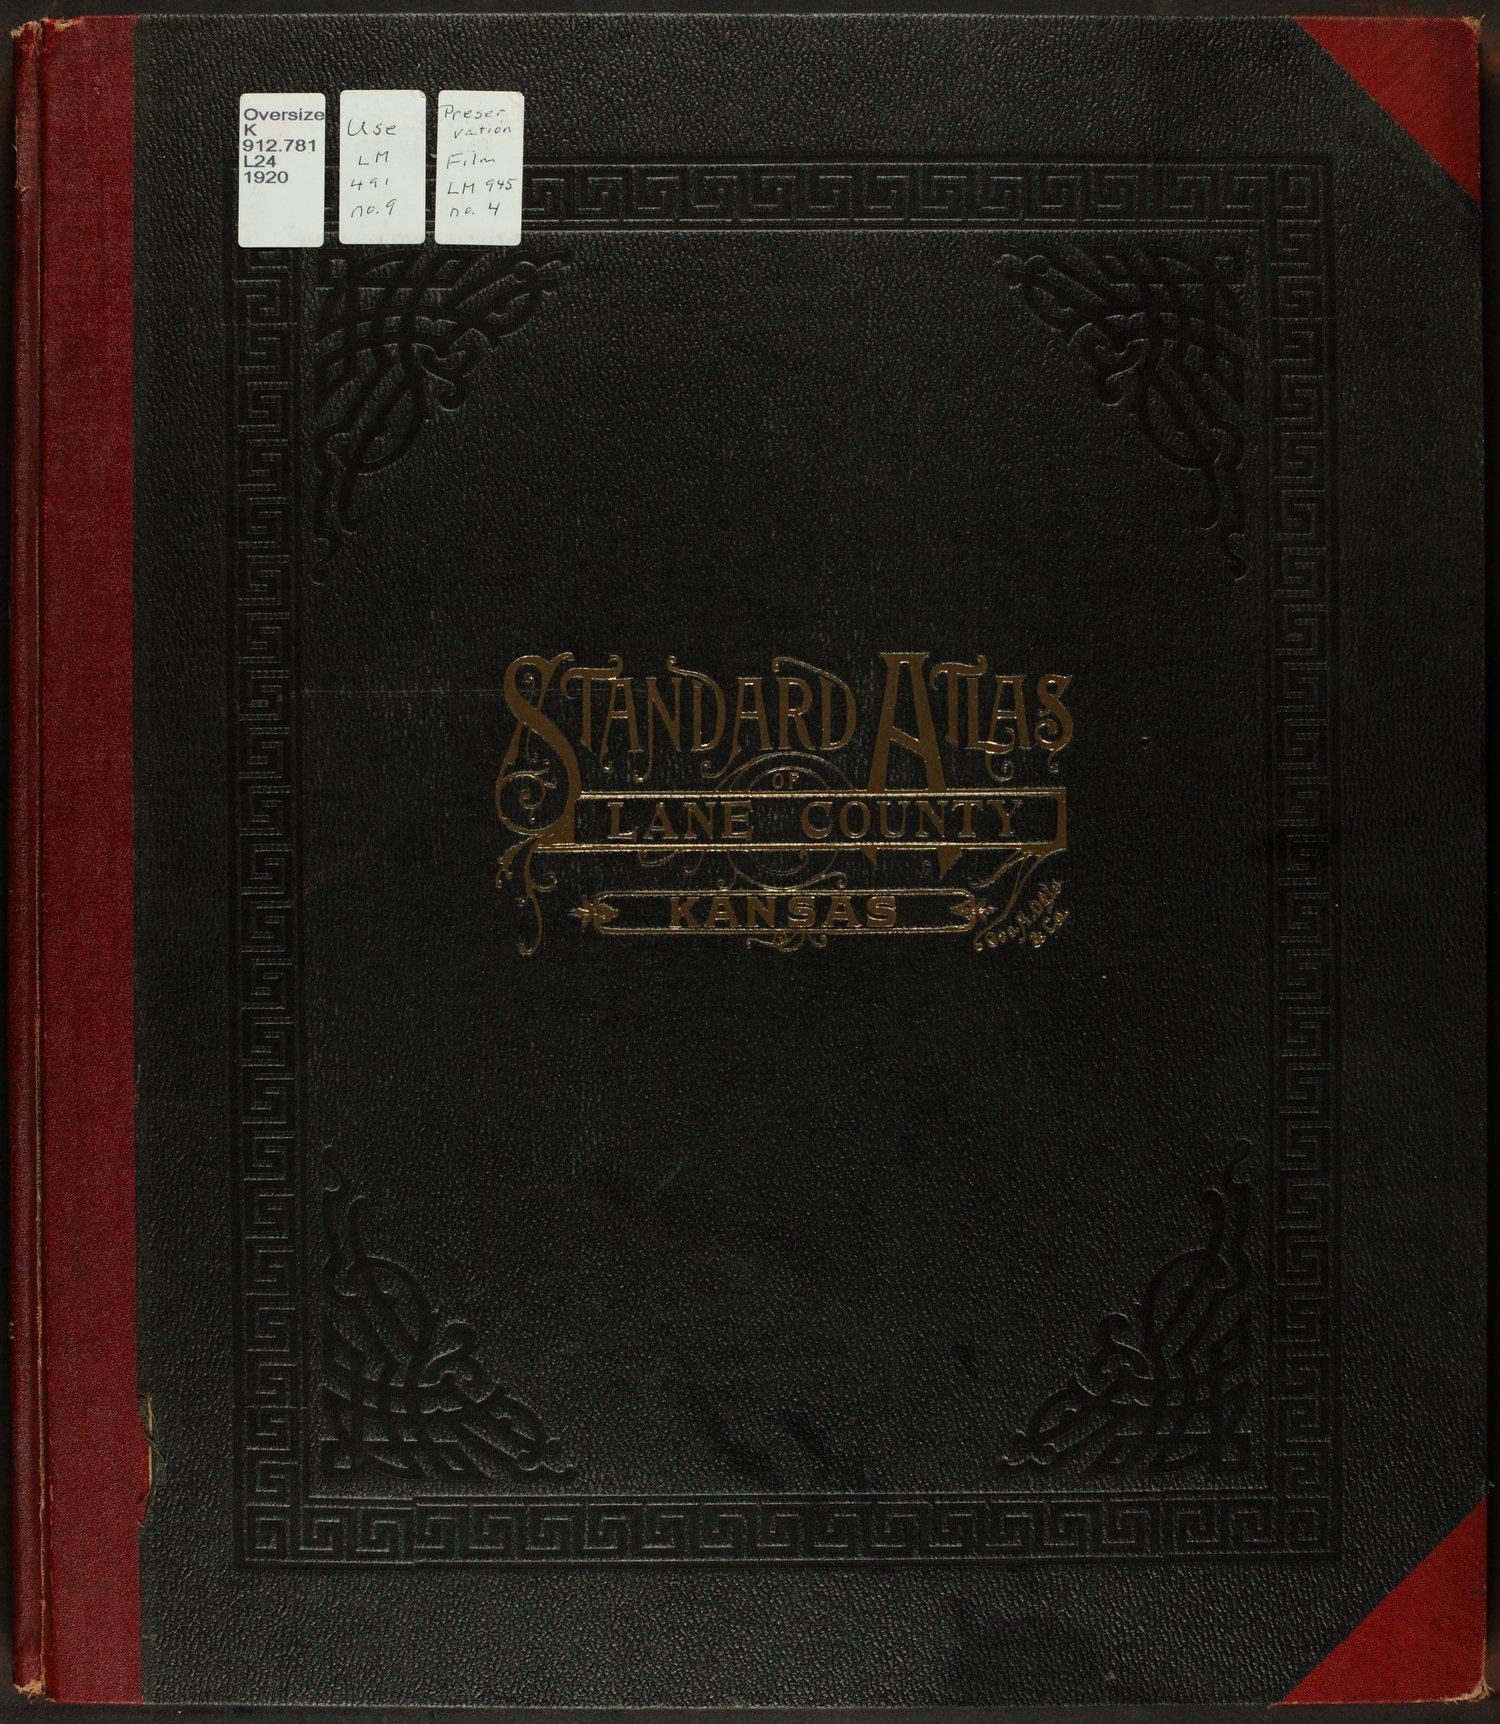 Standard atlas of Lane county, Kansas - Front Cover